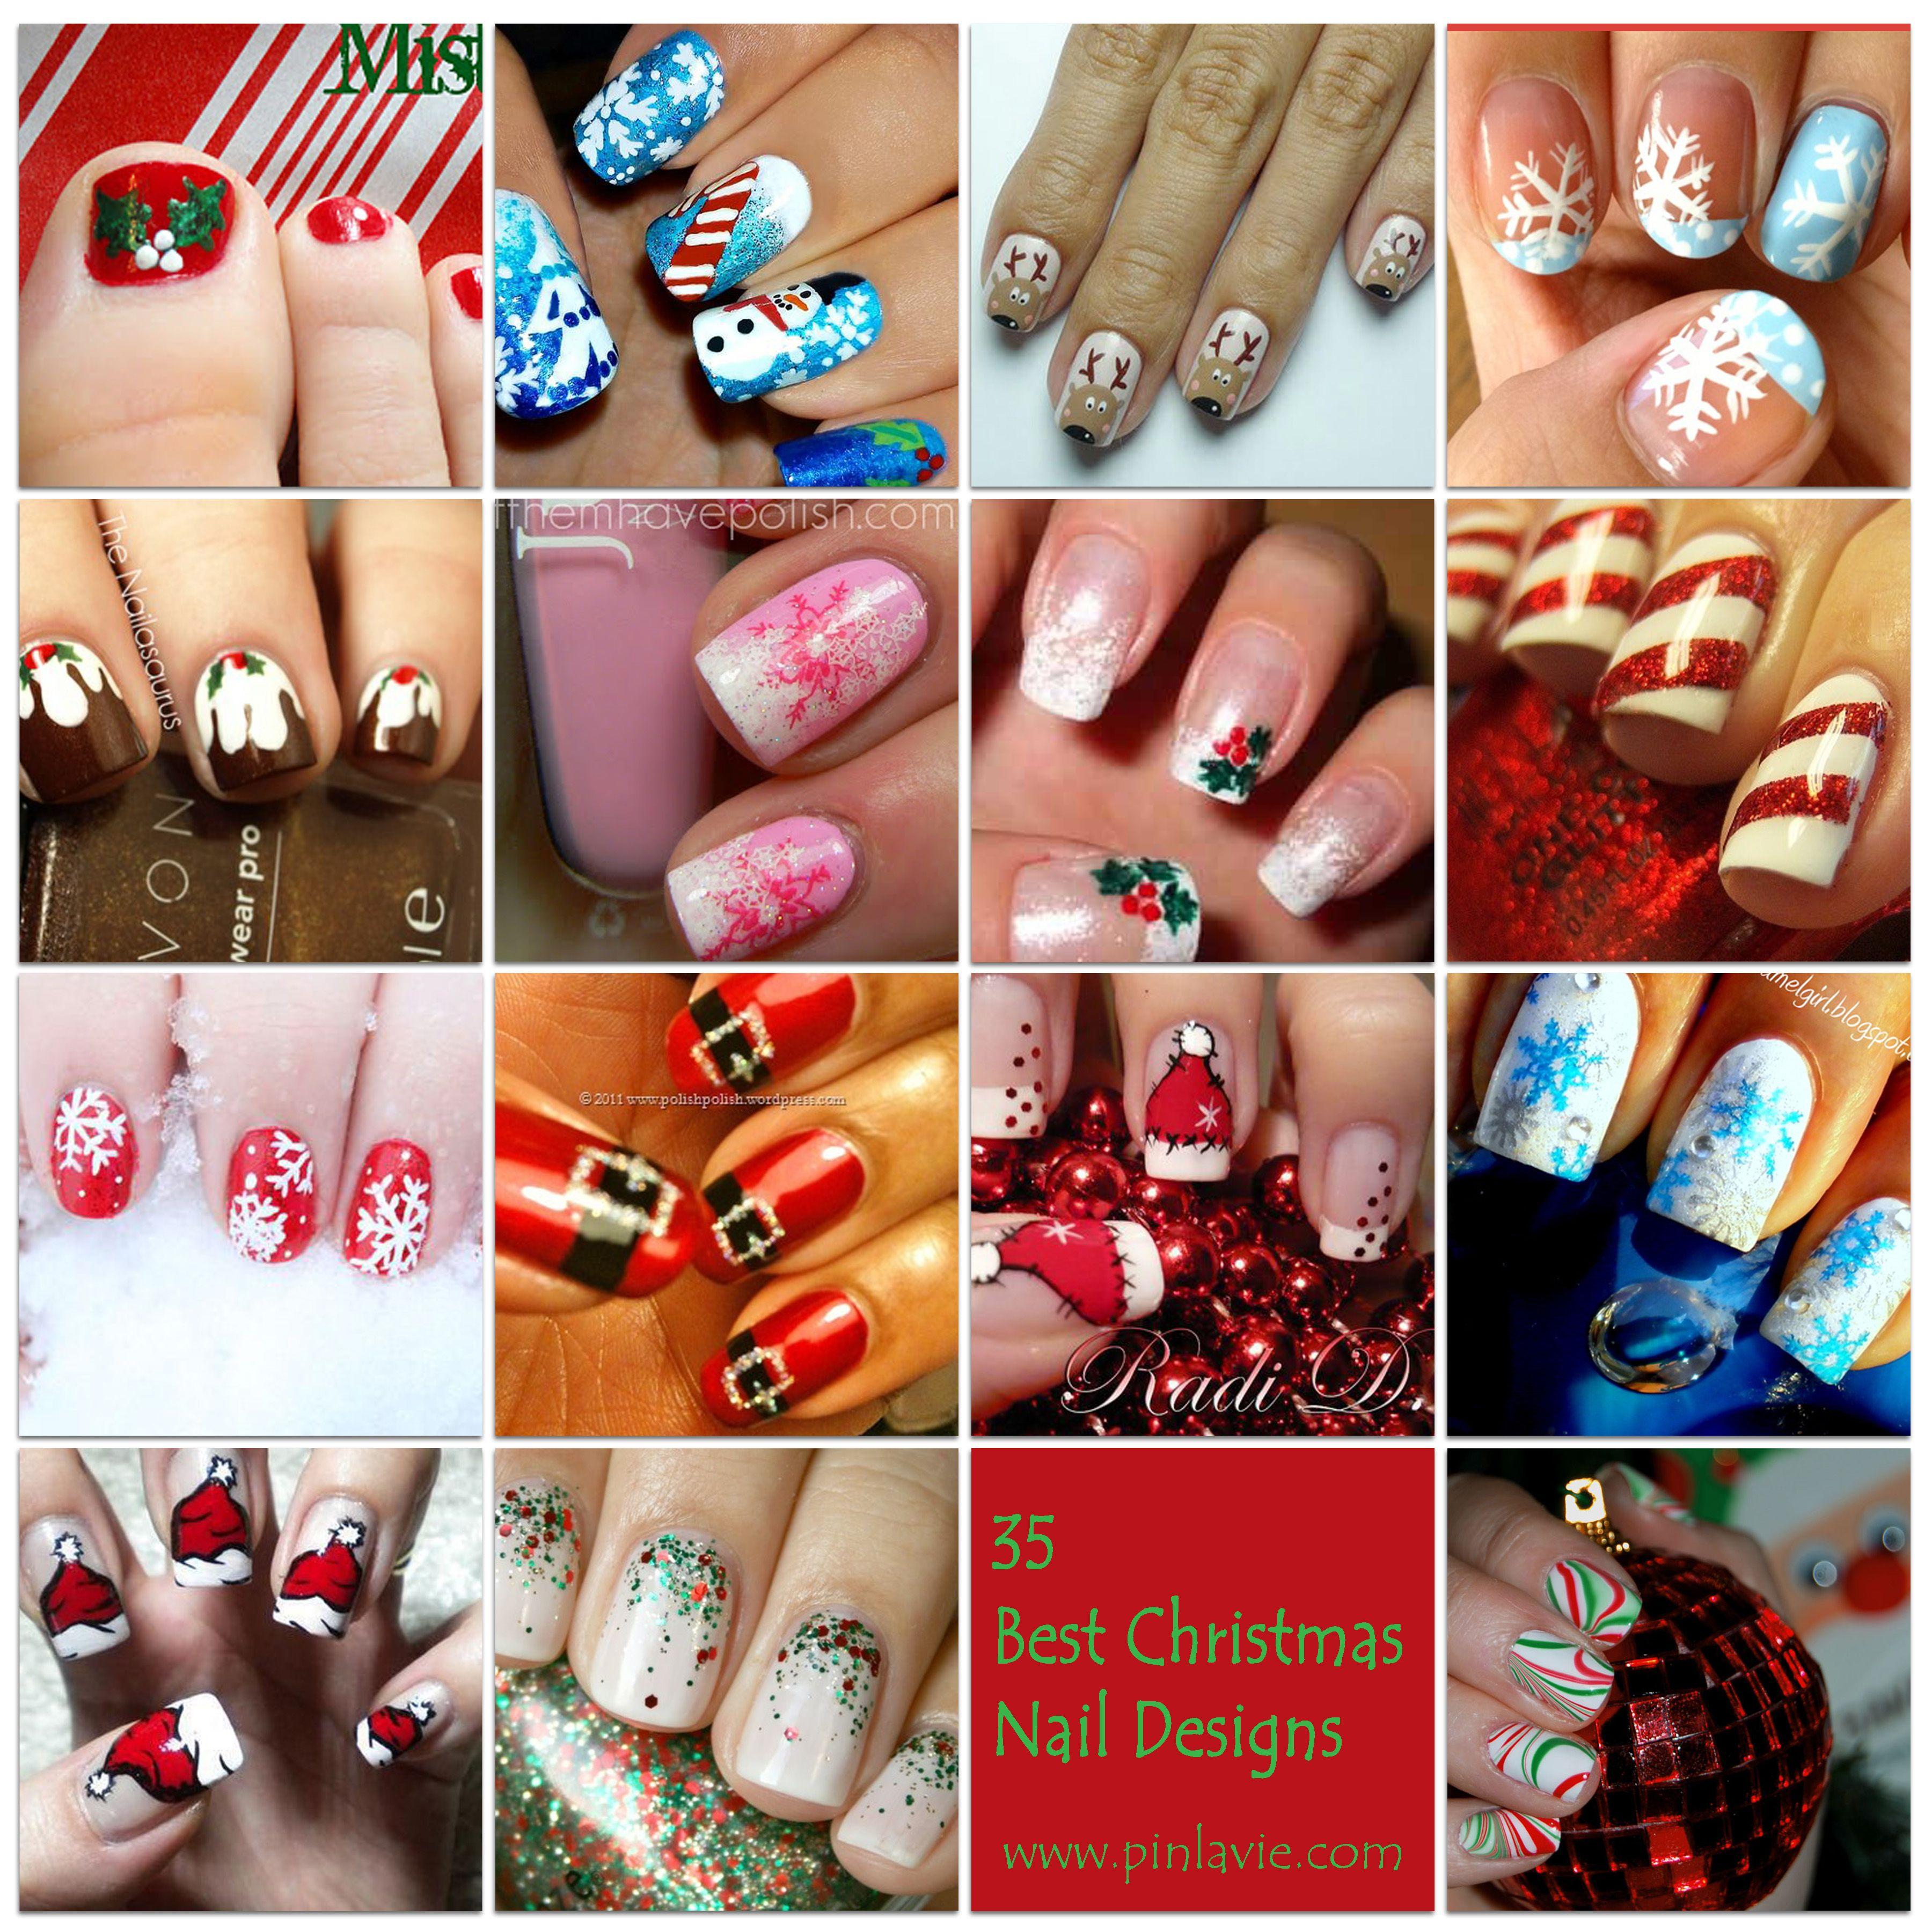 toeNail Designs | ... ... Make your pins come true – 35 Best ...